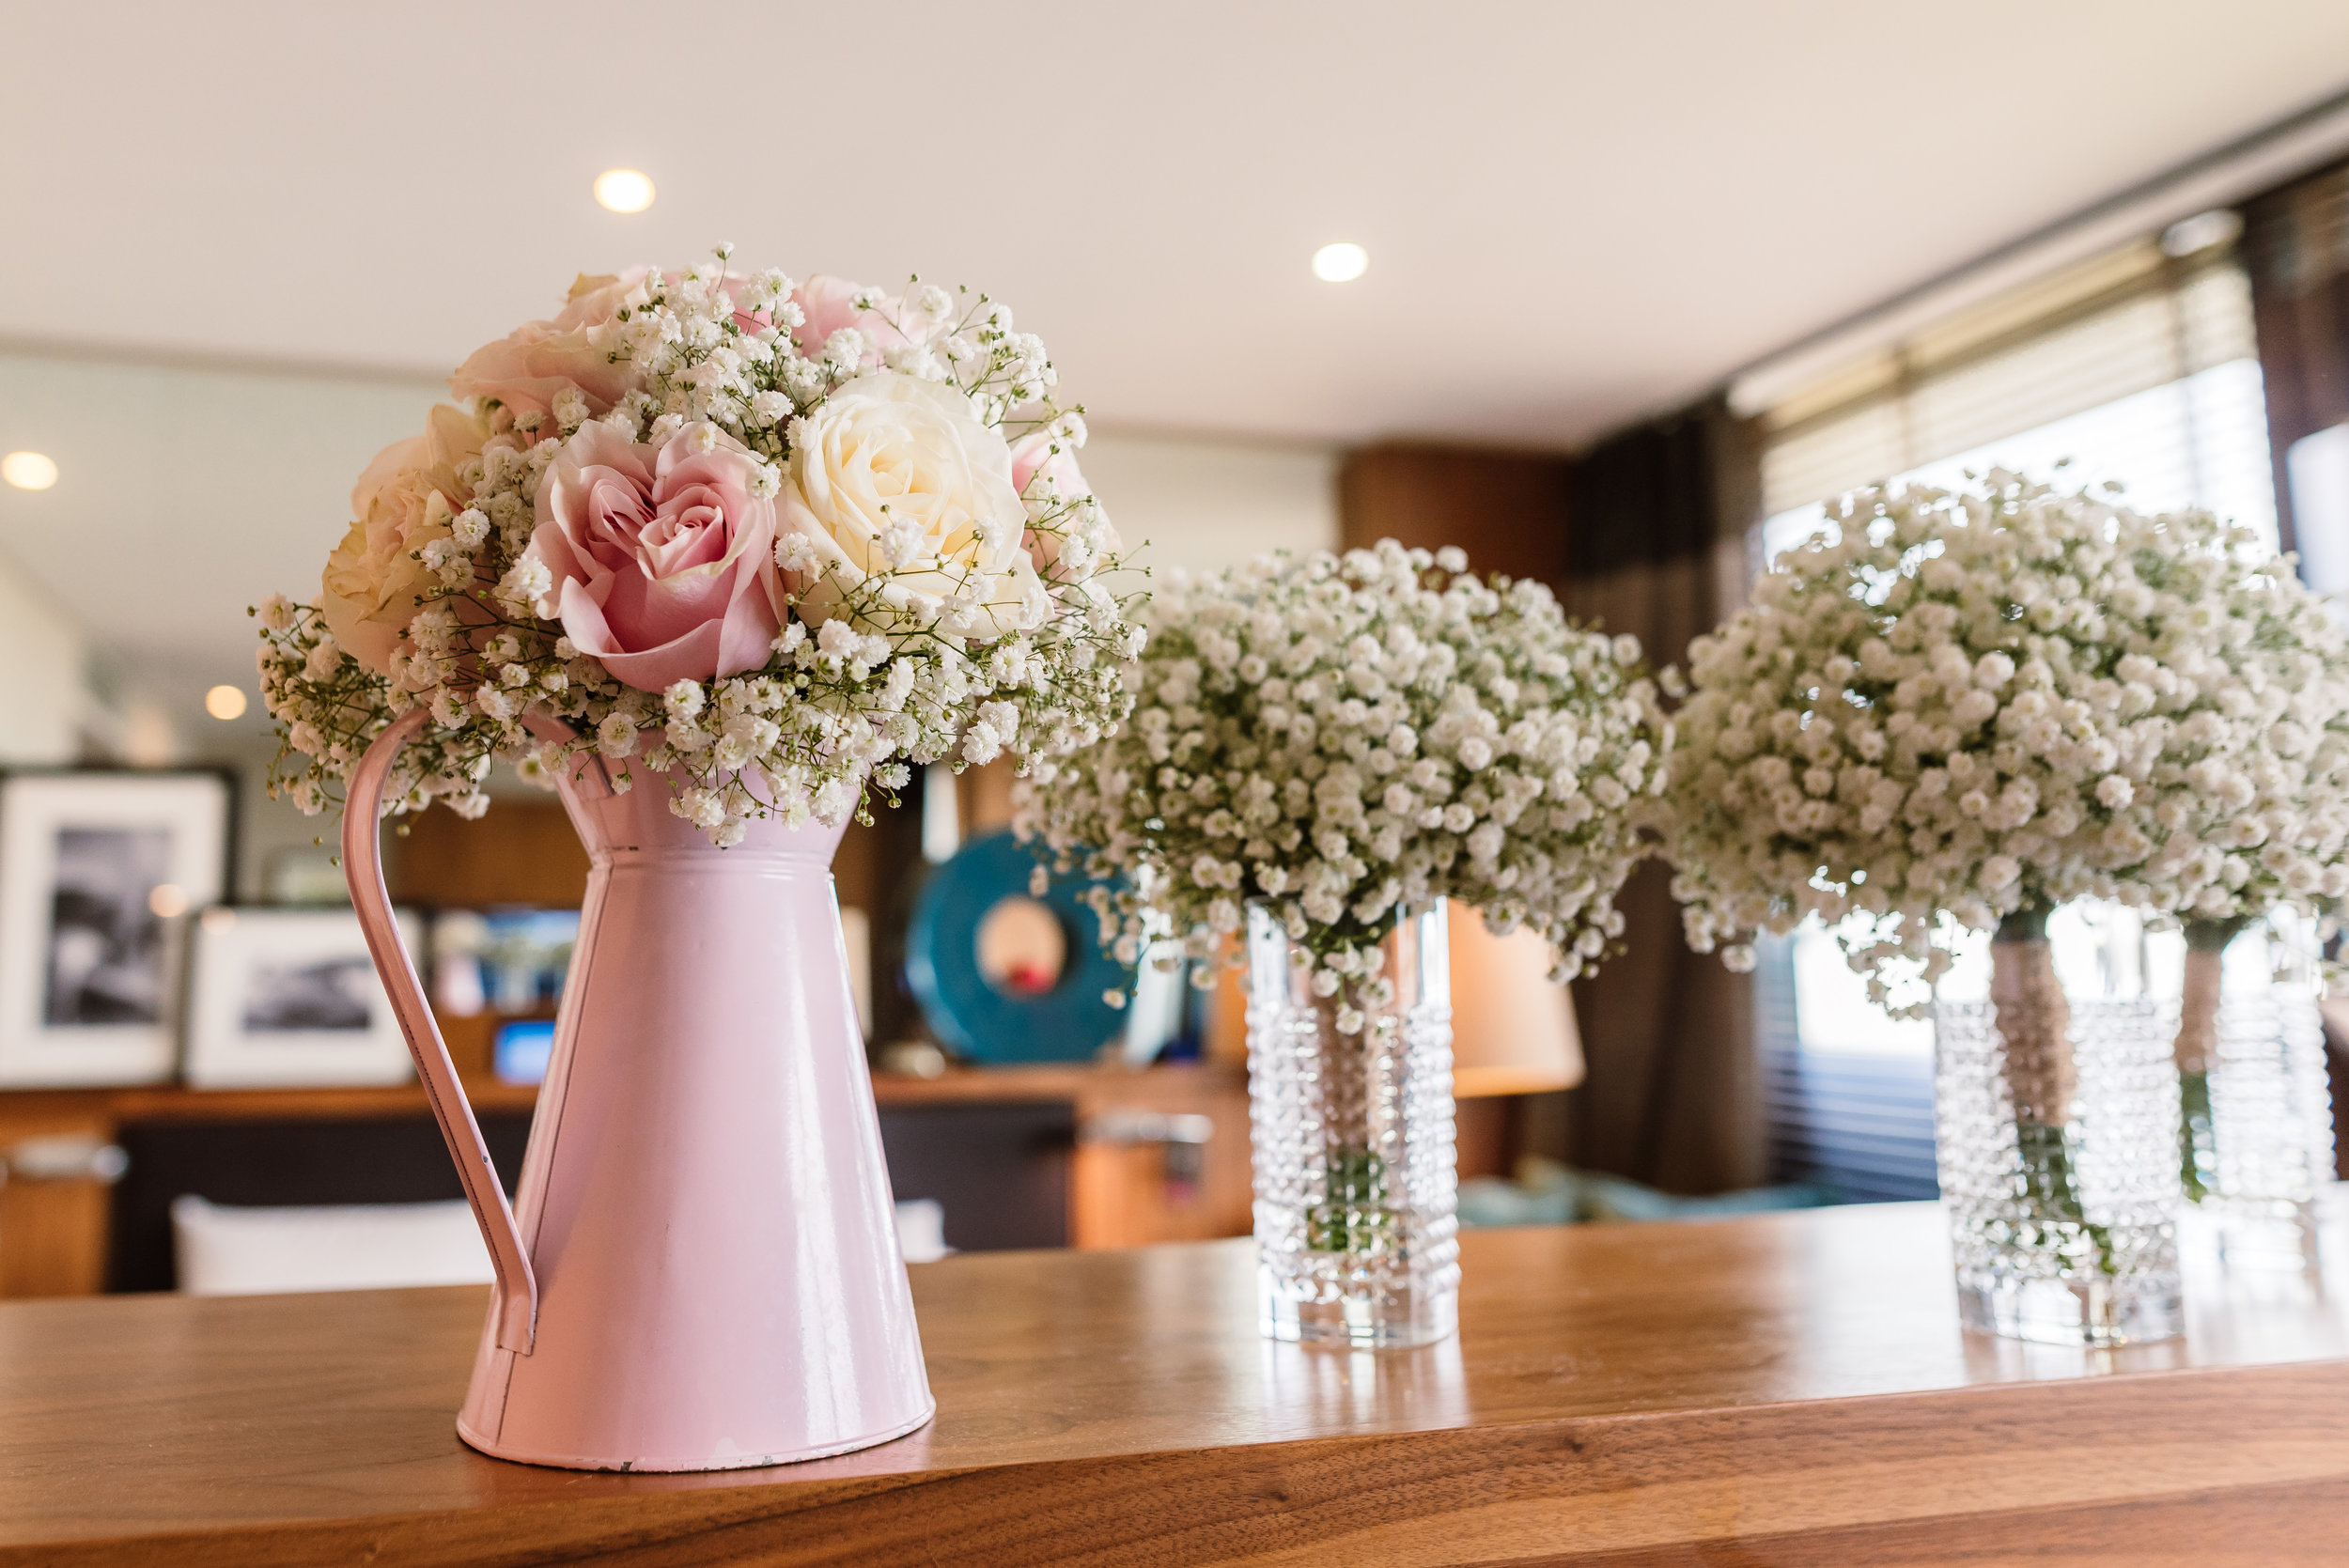 Sarah-Fishlock-Photography : Hampshire-wedding-photographer-hampshire : fleet-wedding-photographer-fleet : Meade-Hall-Wedding-Photographer : Meade-Hall-Wedding-Photos-84.jpg